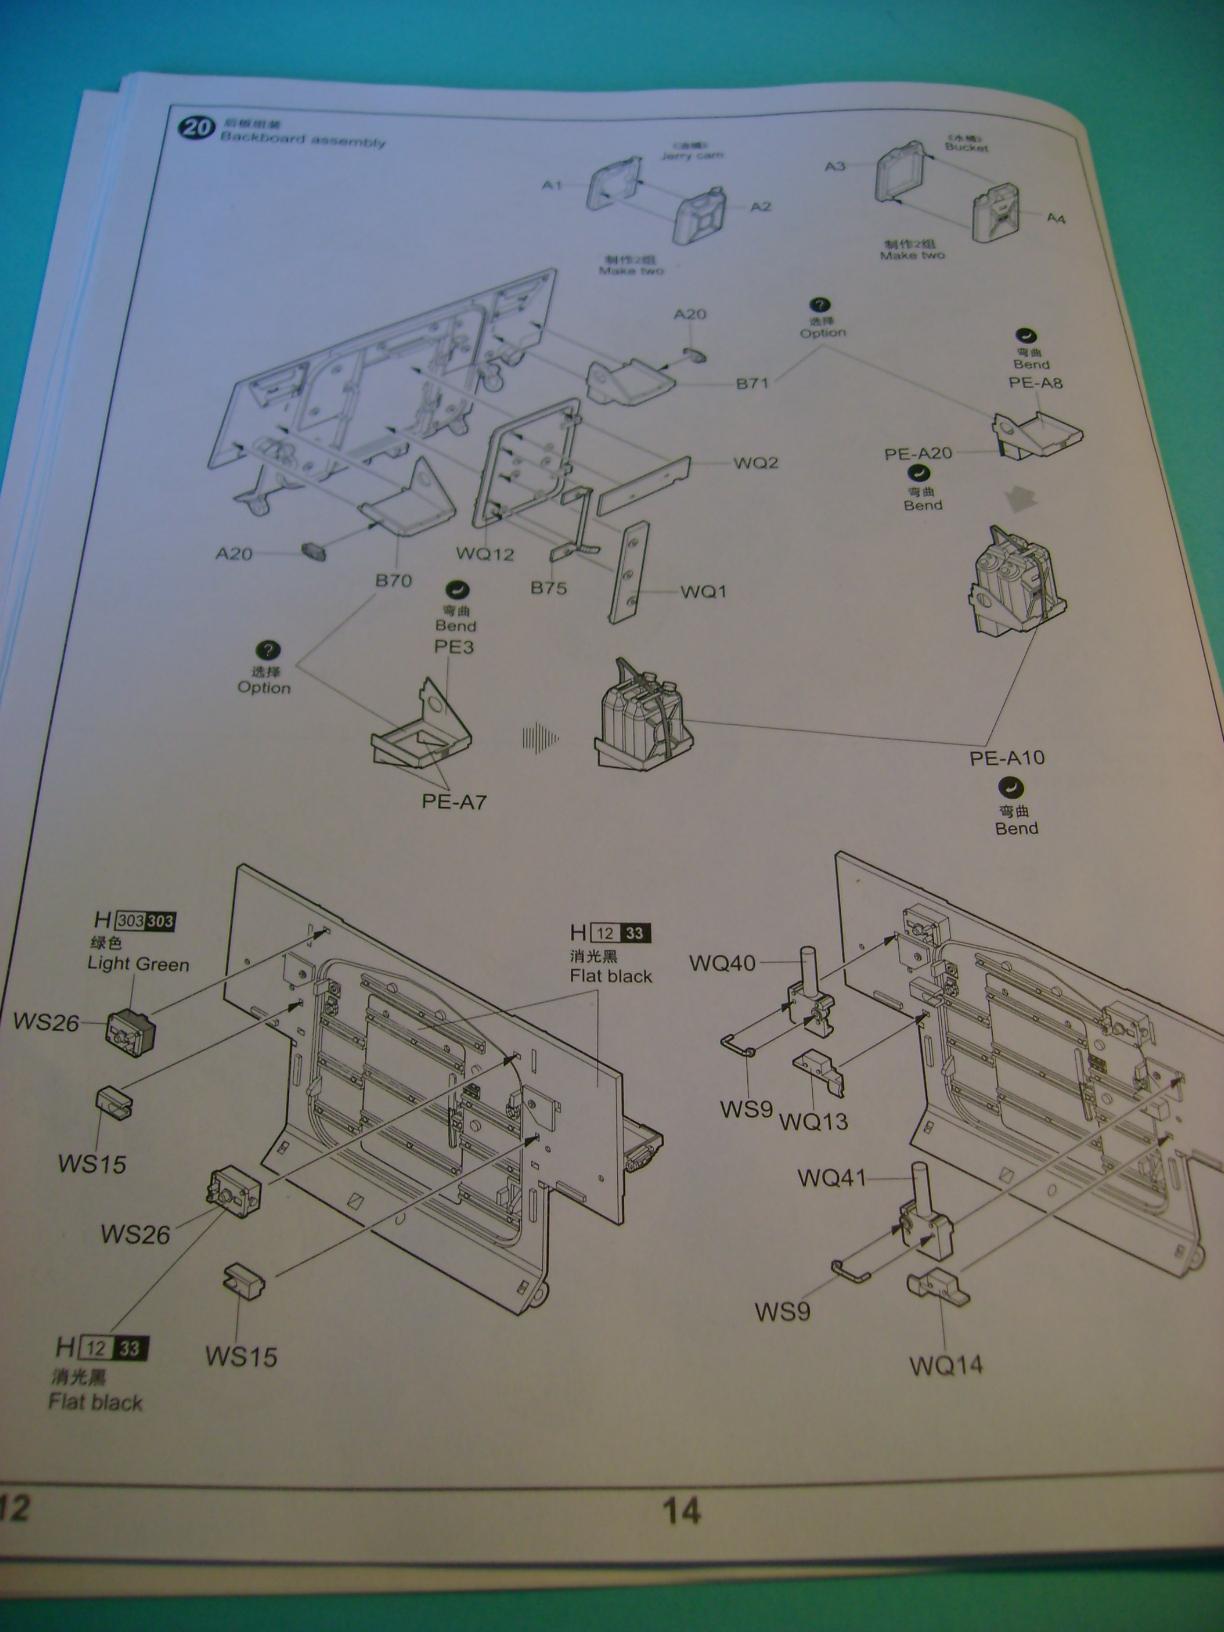 Review Kit M1129 Stryker Mortar Carrier Vehicle MC-B Trumpeter 1/35... Dsc02244b